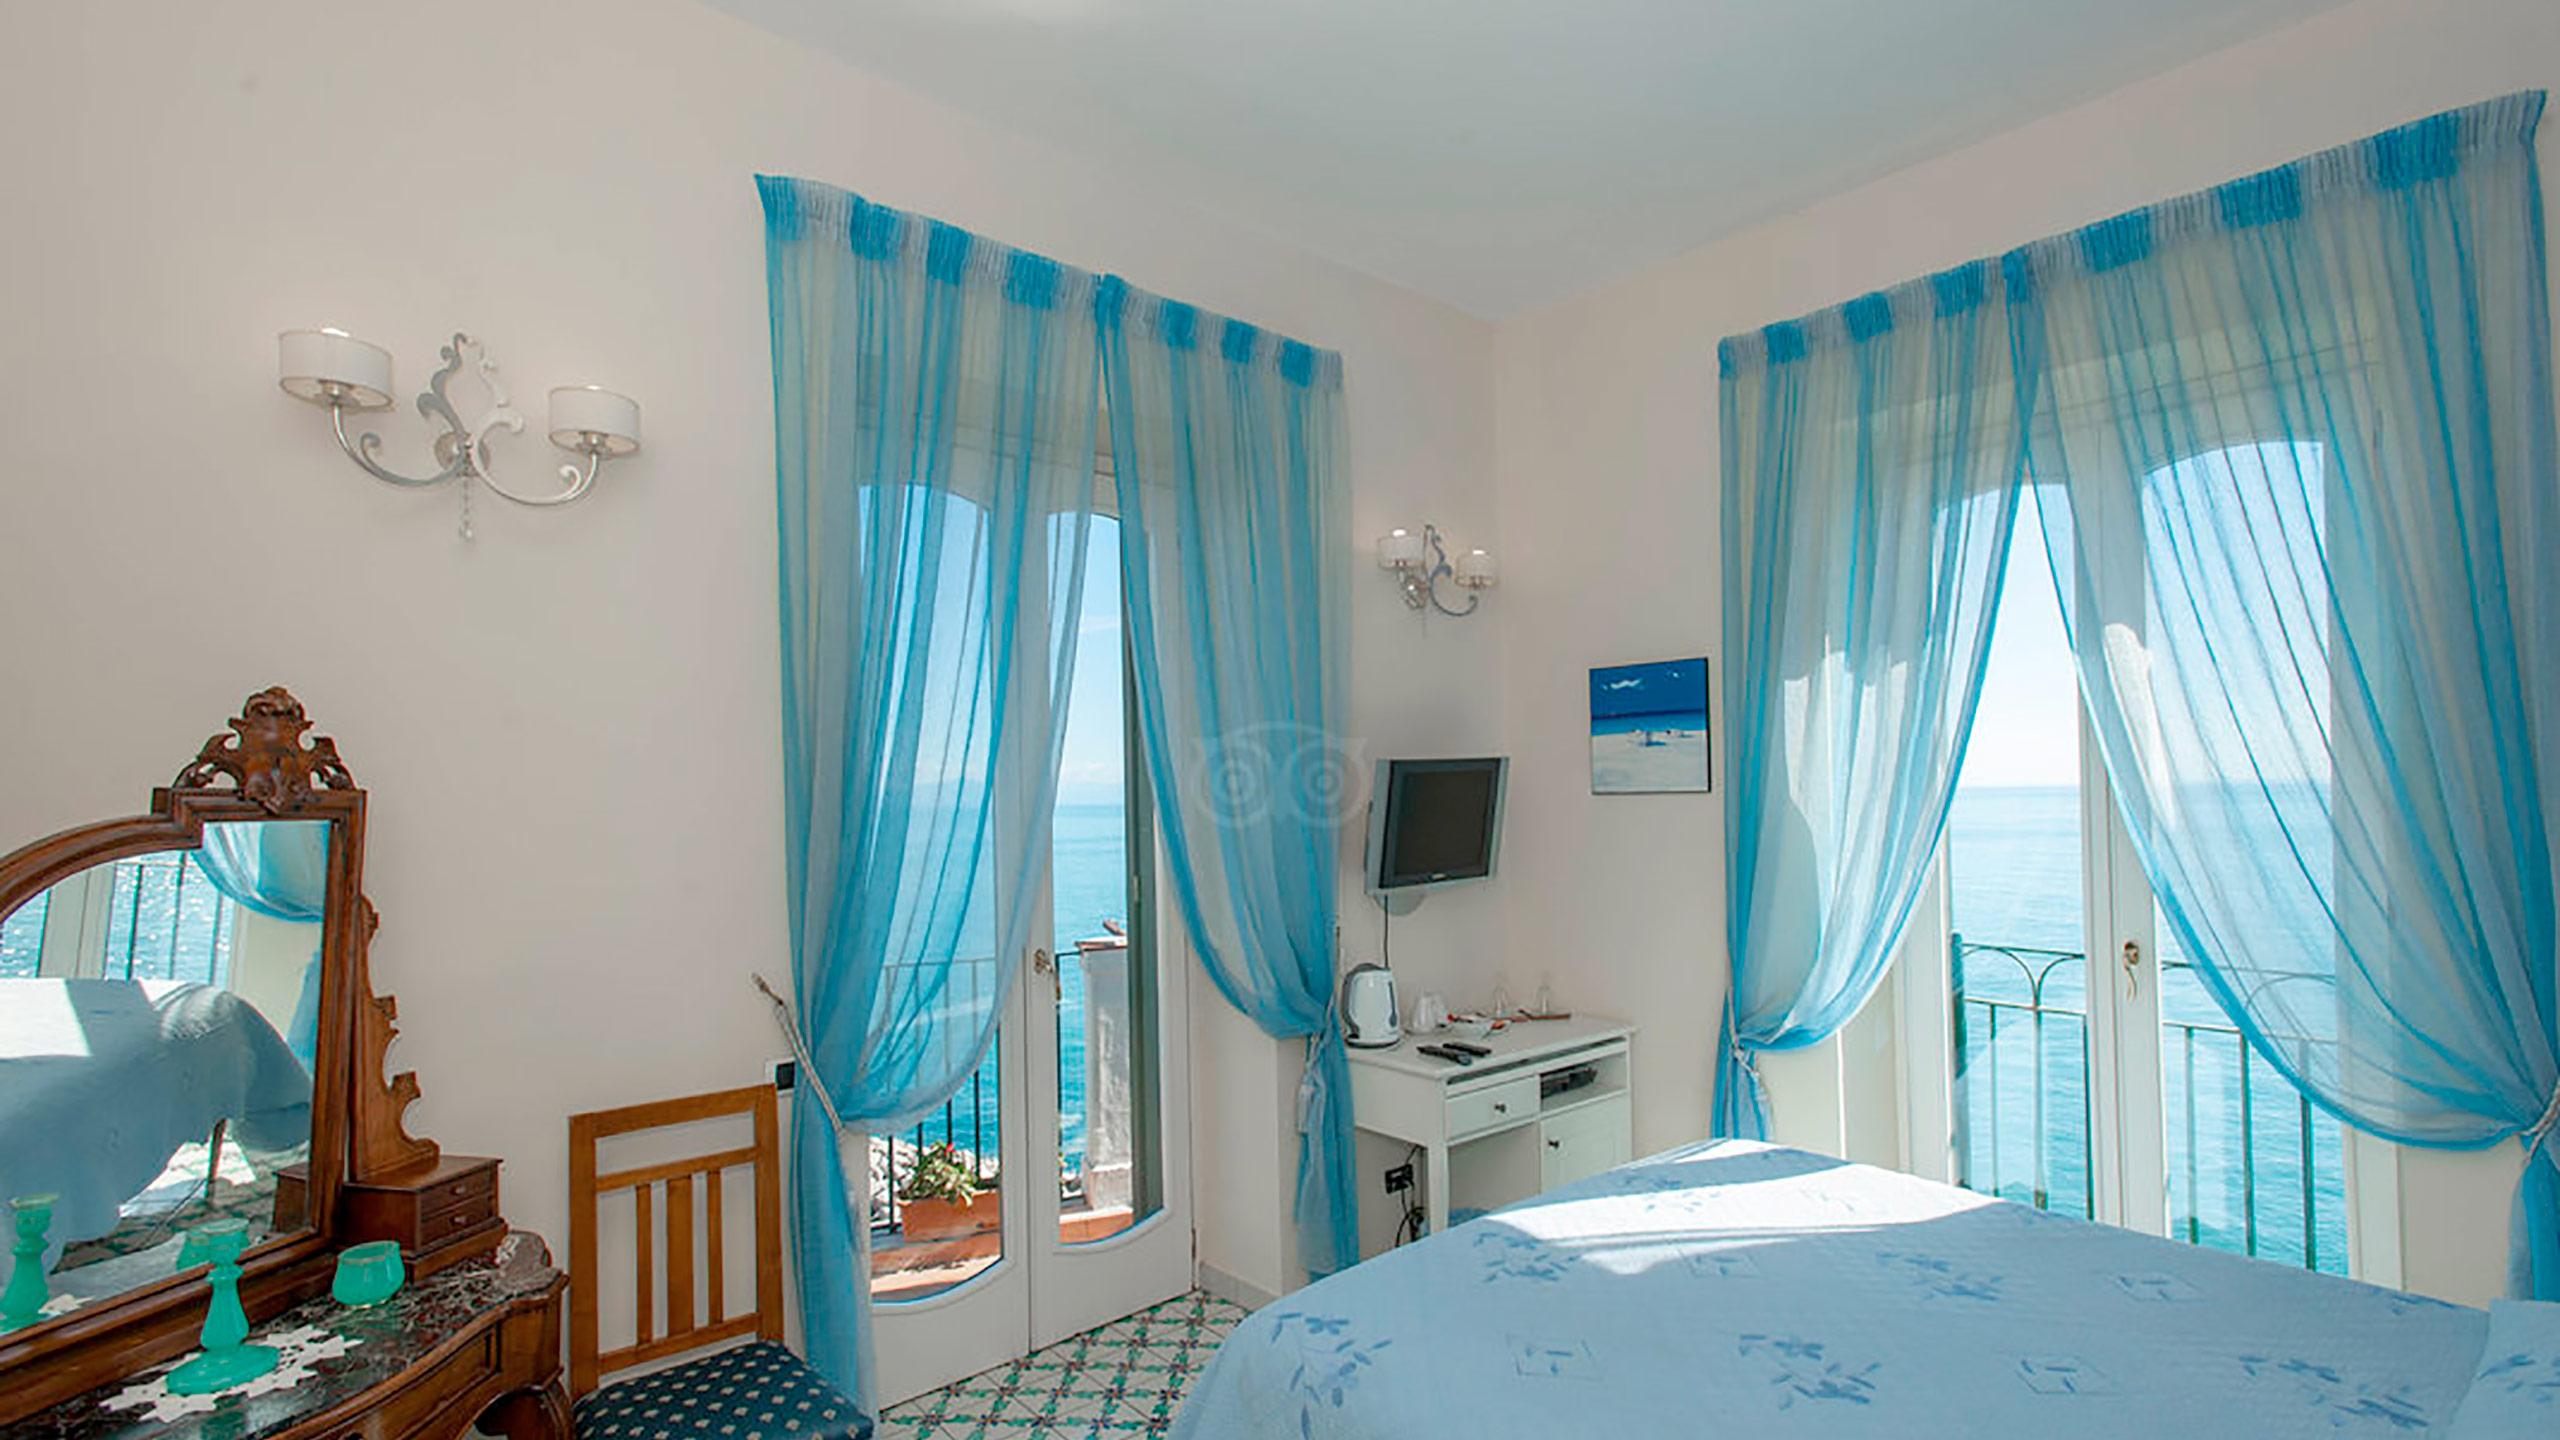 la-rondine-room--v10056866